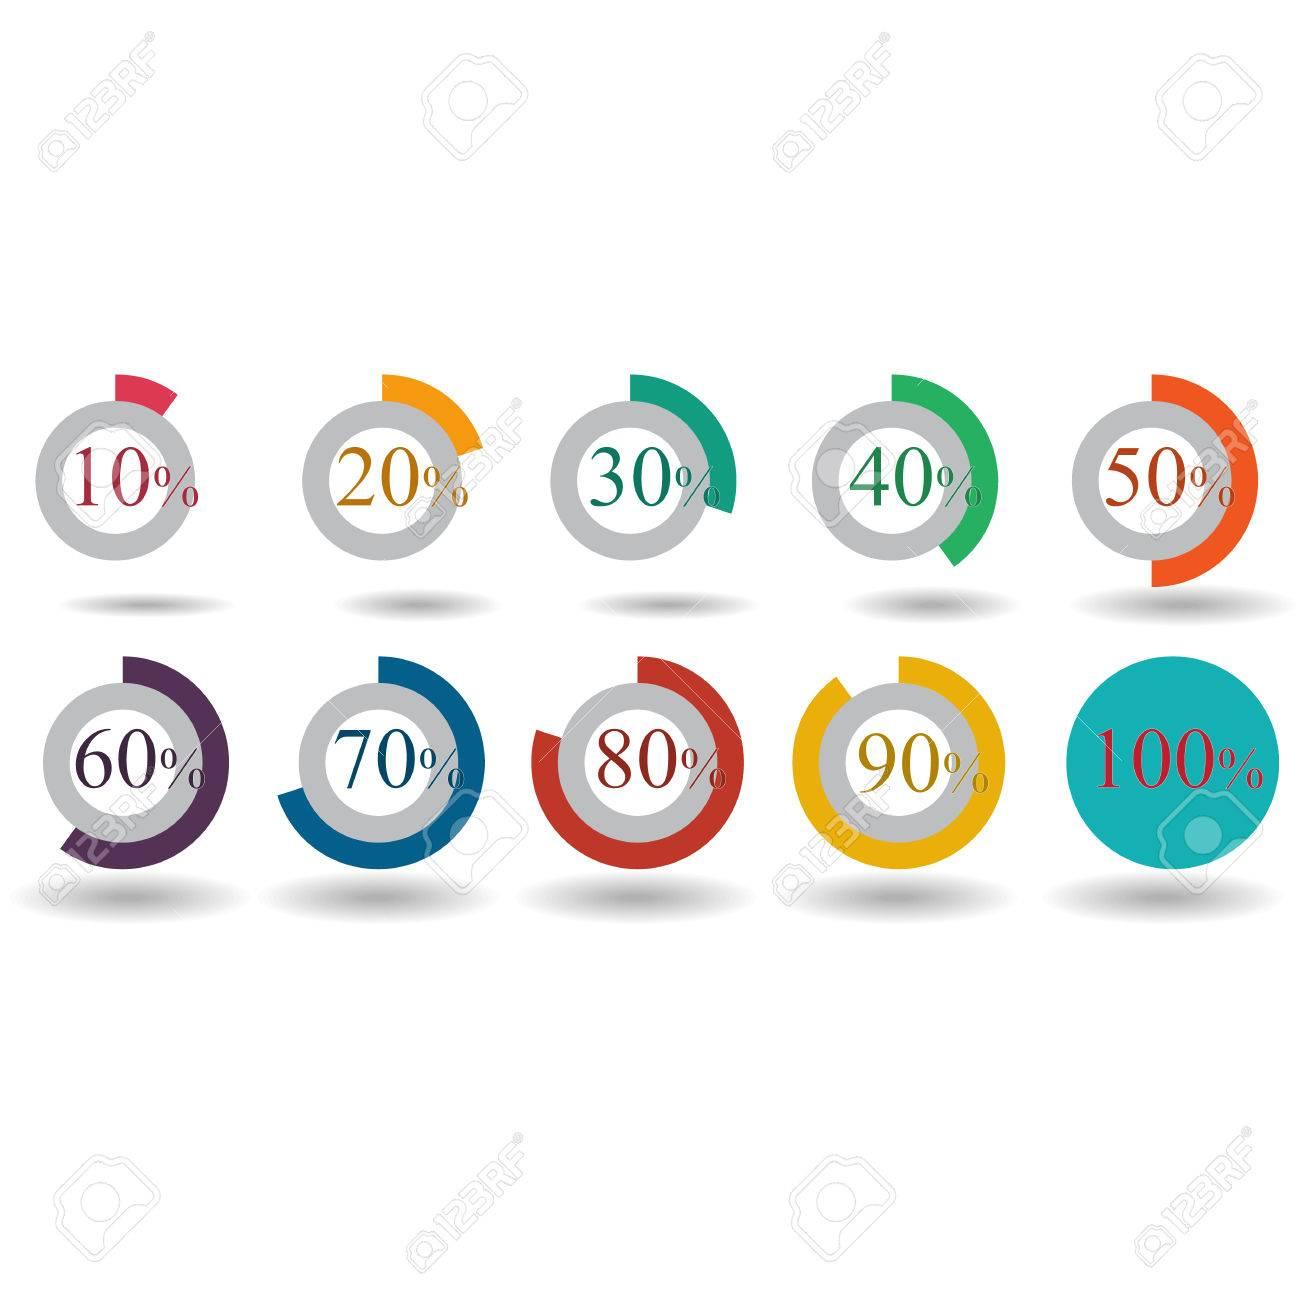 pie graph circle percentage chart 10 20 30 40 50 60 70 80 90